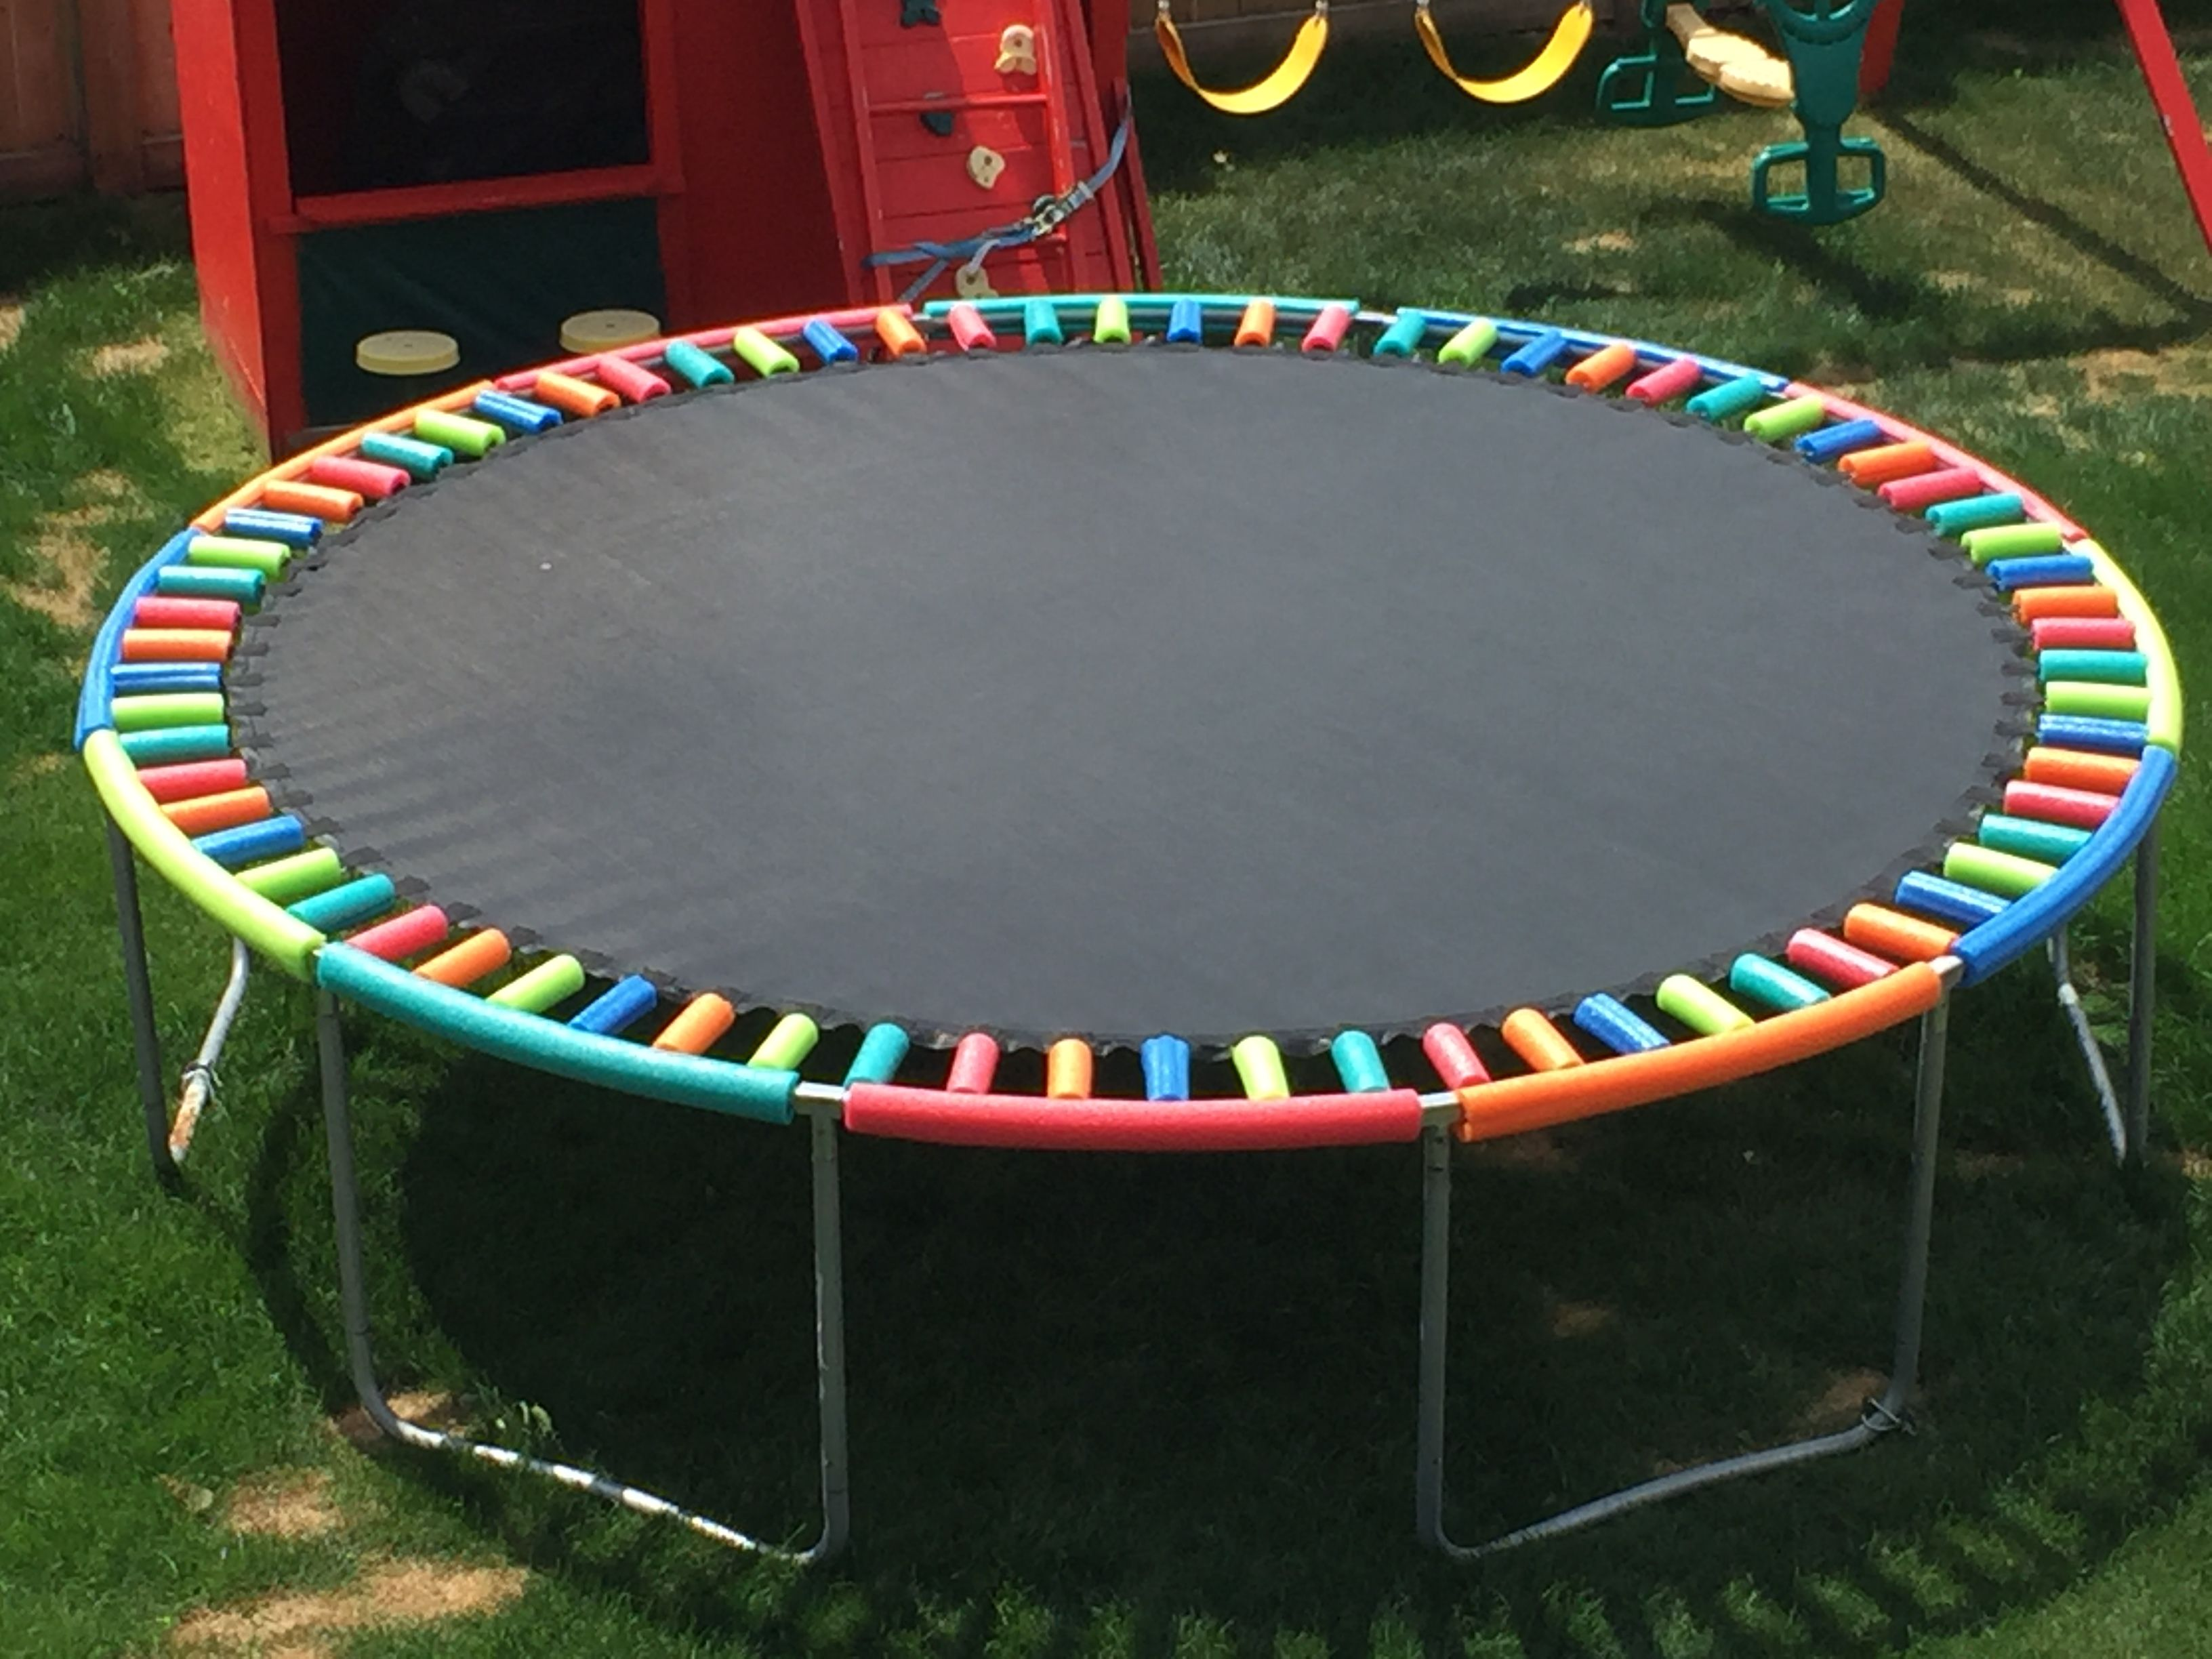 Diy Pool Noodle Safety Hack For Springs On Trampoline Diy Hinterhof Diy Pool Ideen Diy Spielplatz